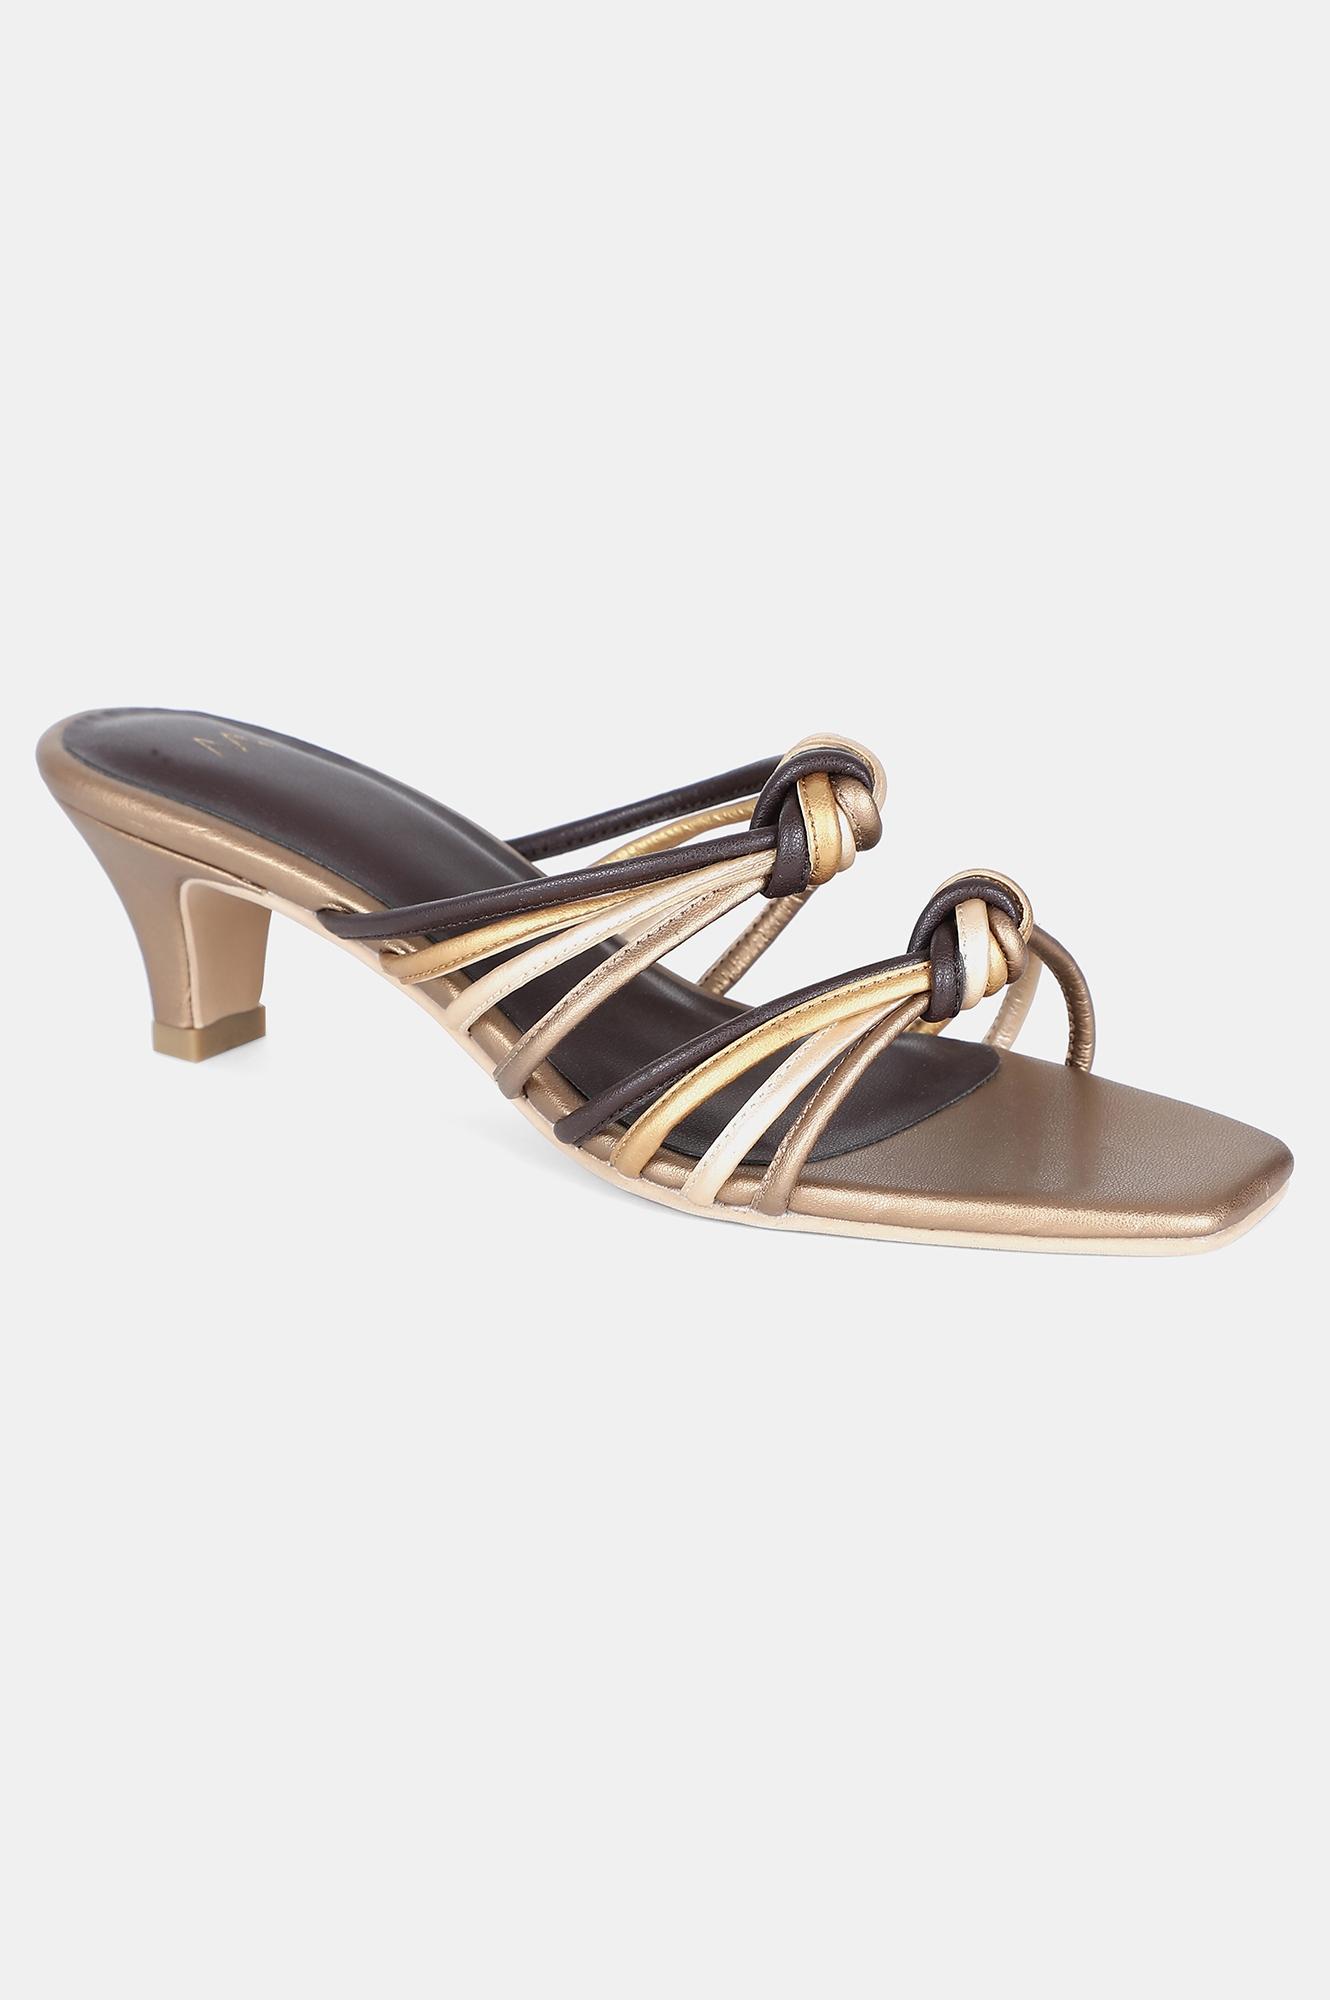 W | Gold Multi Square Toe Solid Kitten Heel